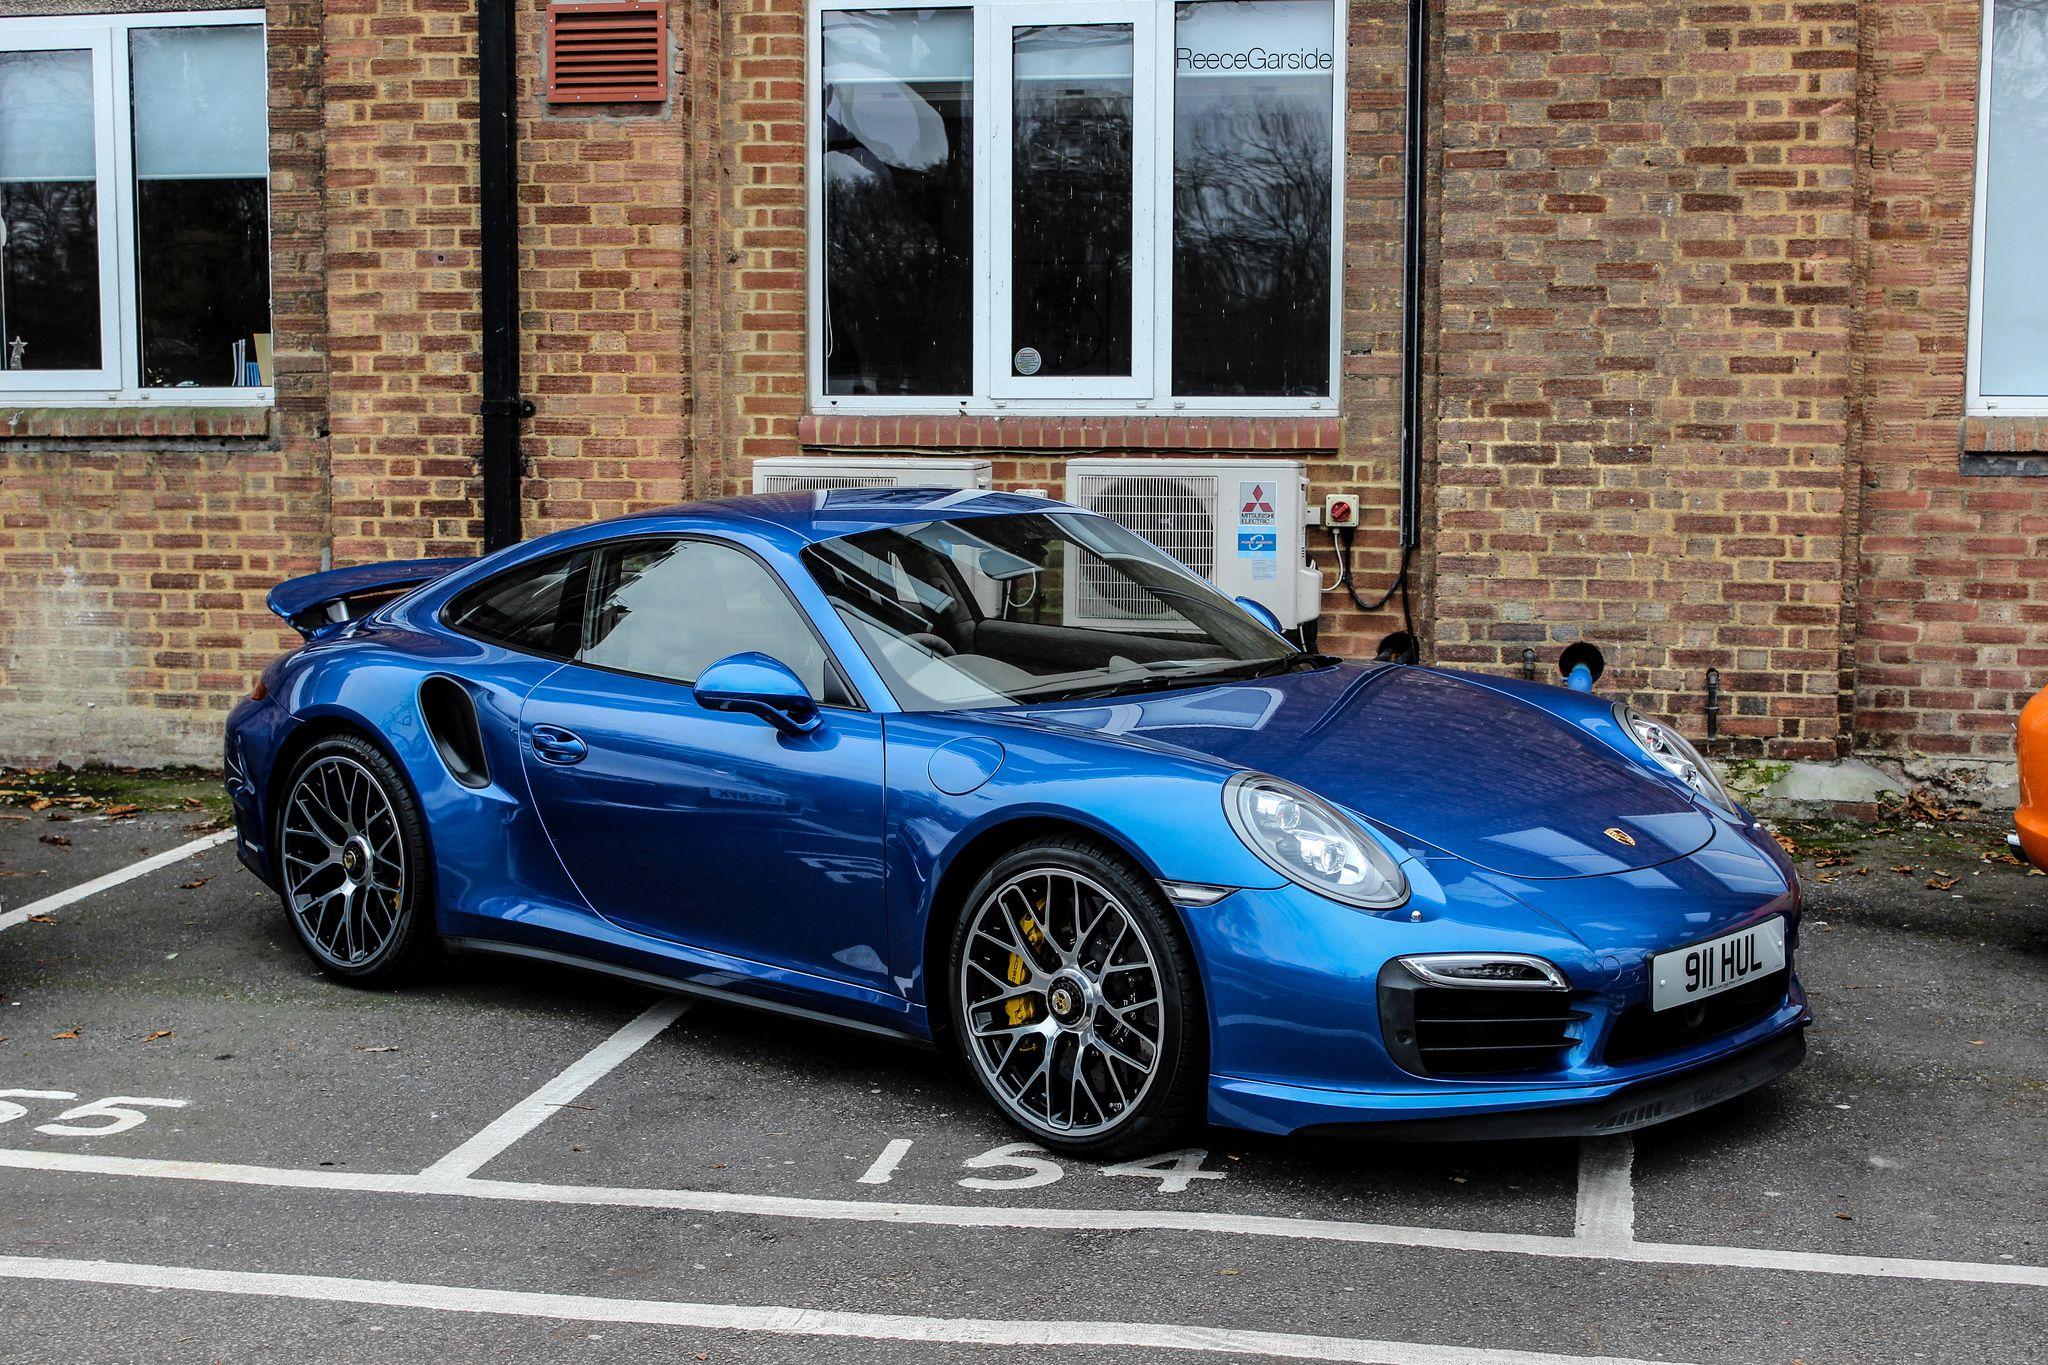 Turbo S Porsche Turbo S Porsche Porsche 911 Turbo